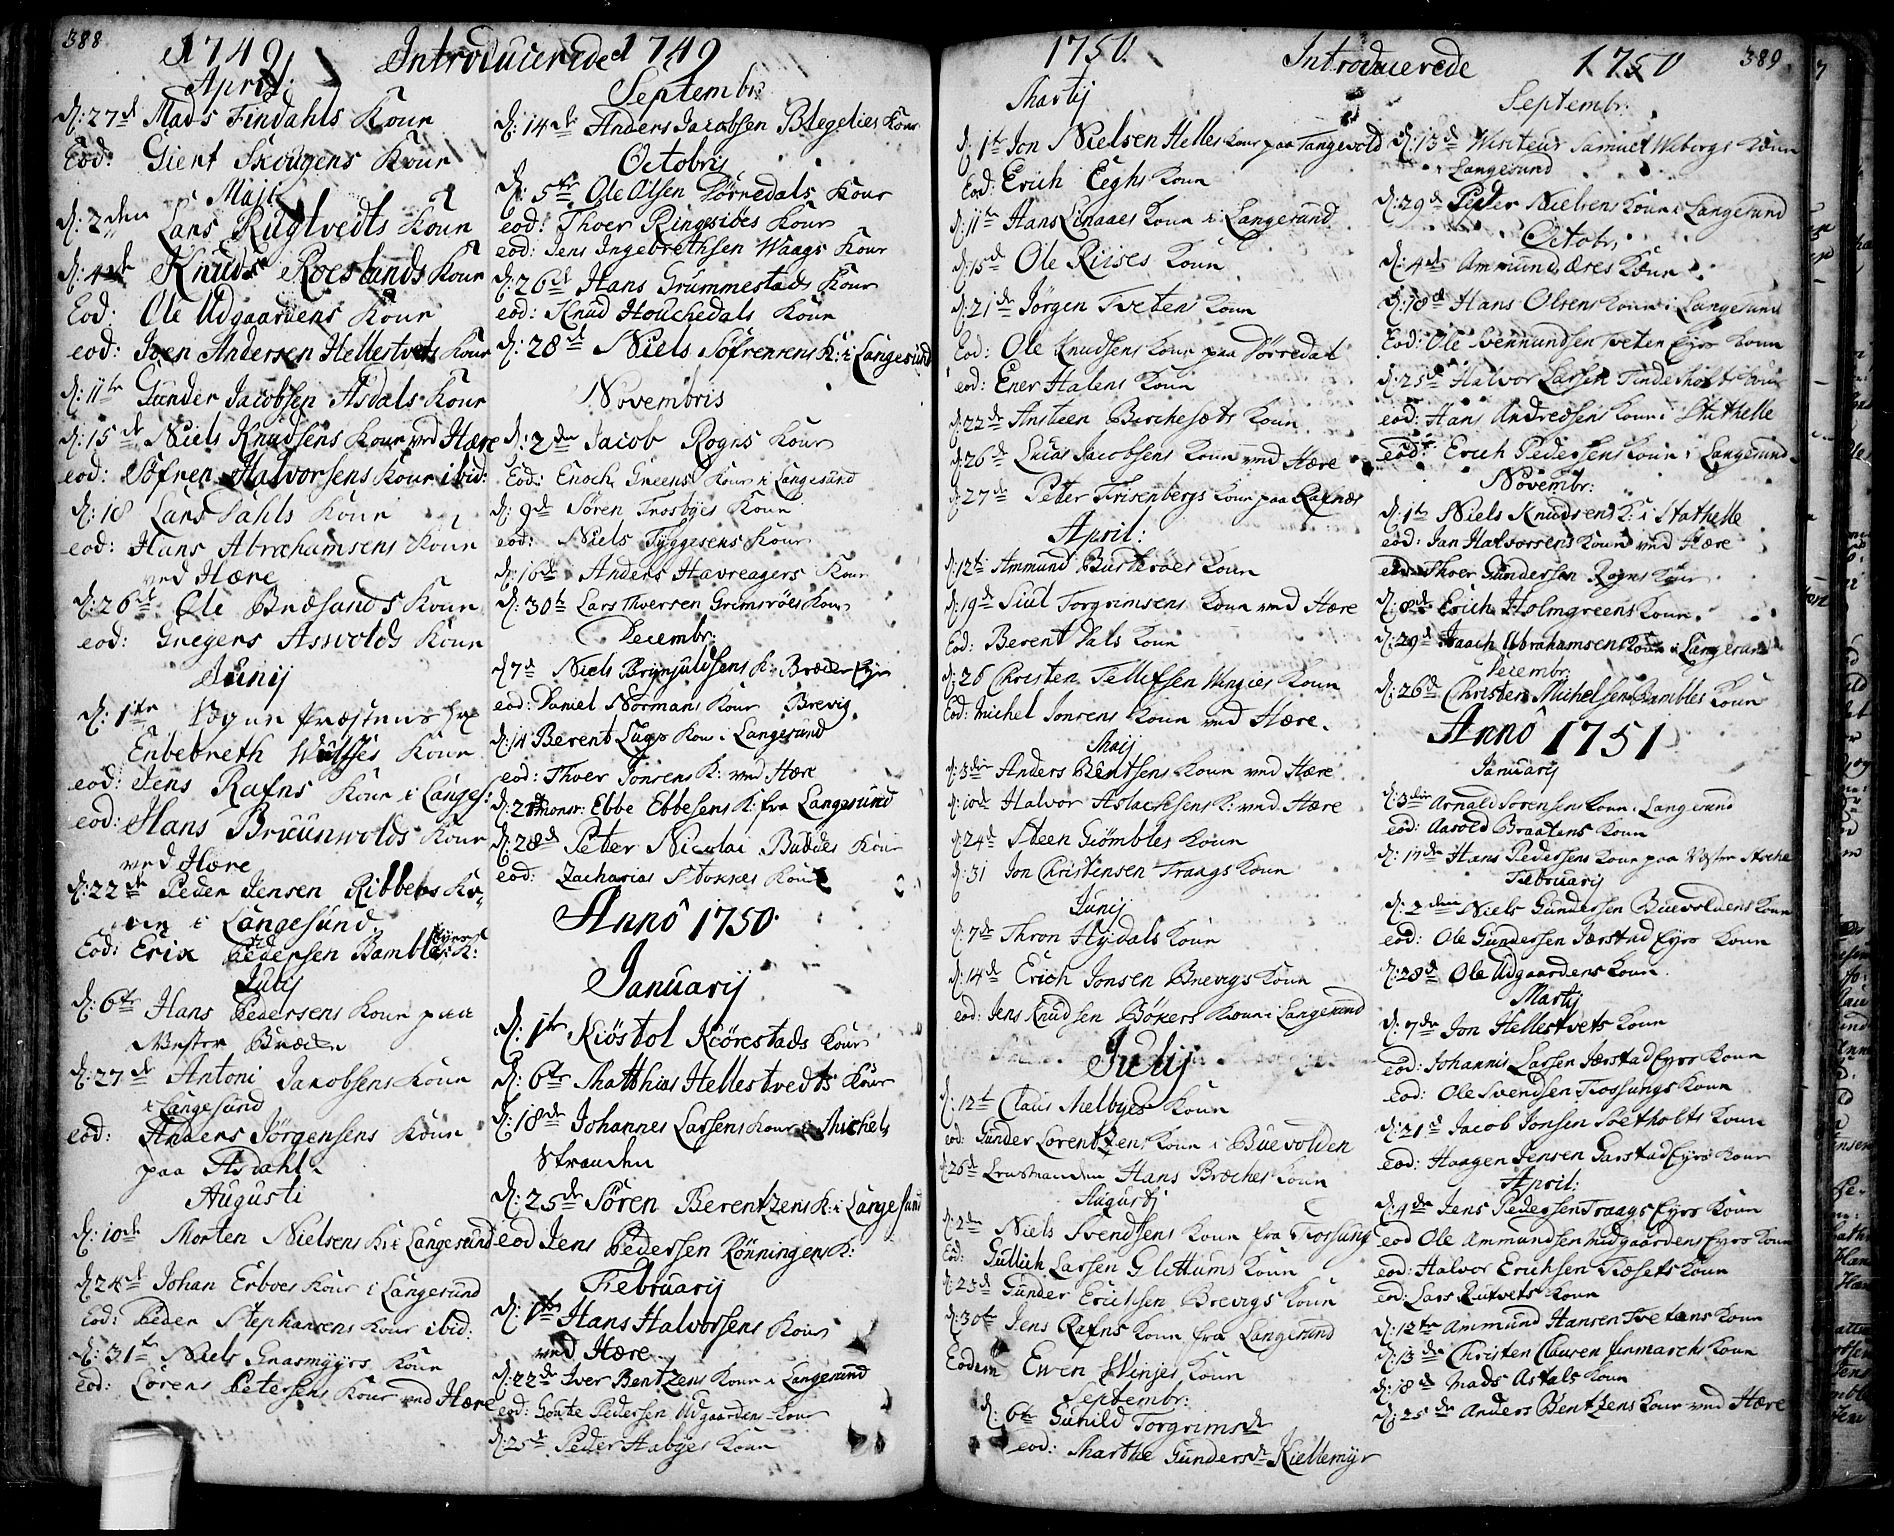 SAKO, Bamble kirkebøker, F/Fa/L0001: Ministerialbok nr. I 1, 1702-1774, s. 388-389